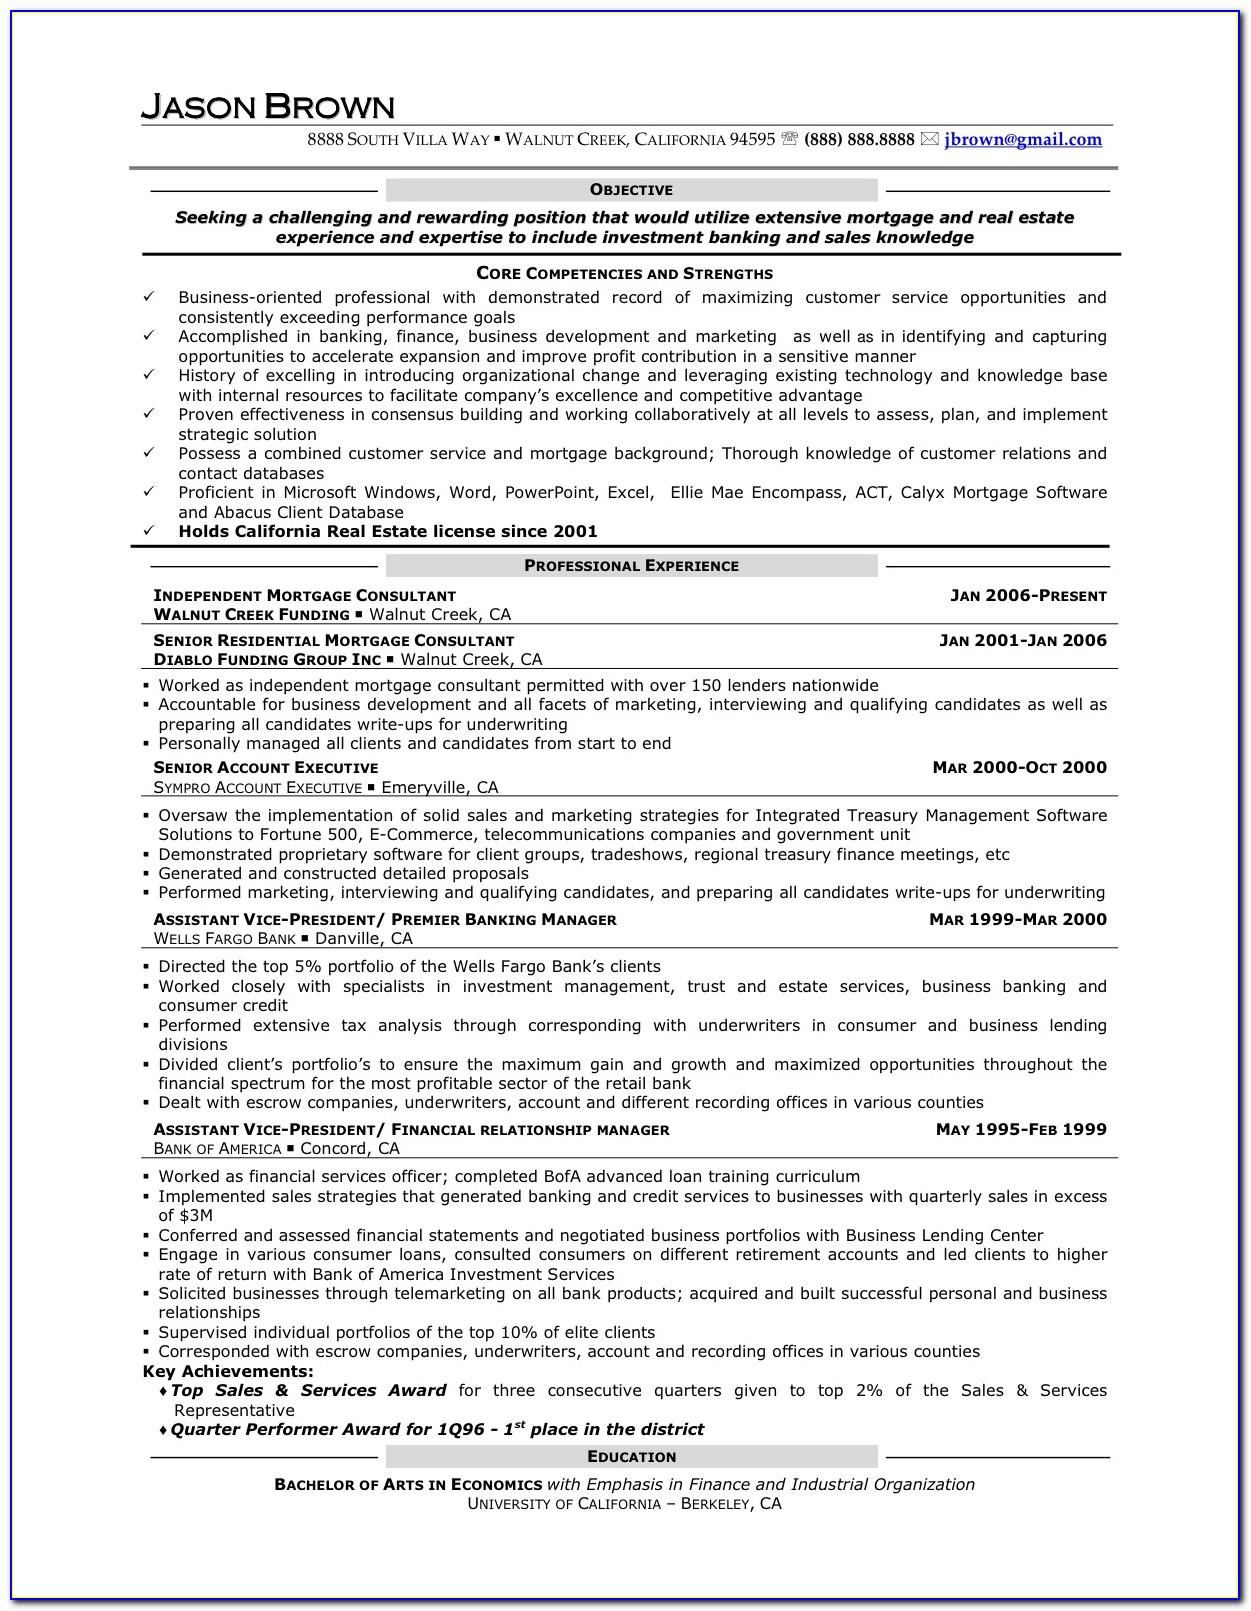 Resume Building Consultants